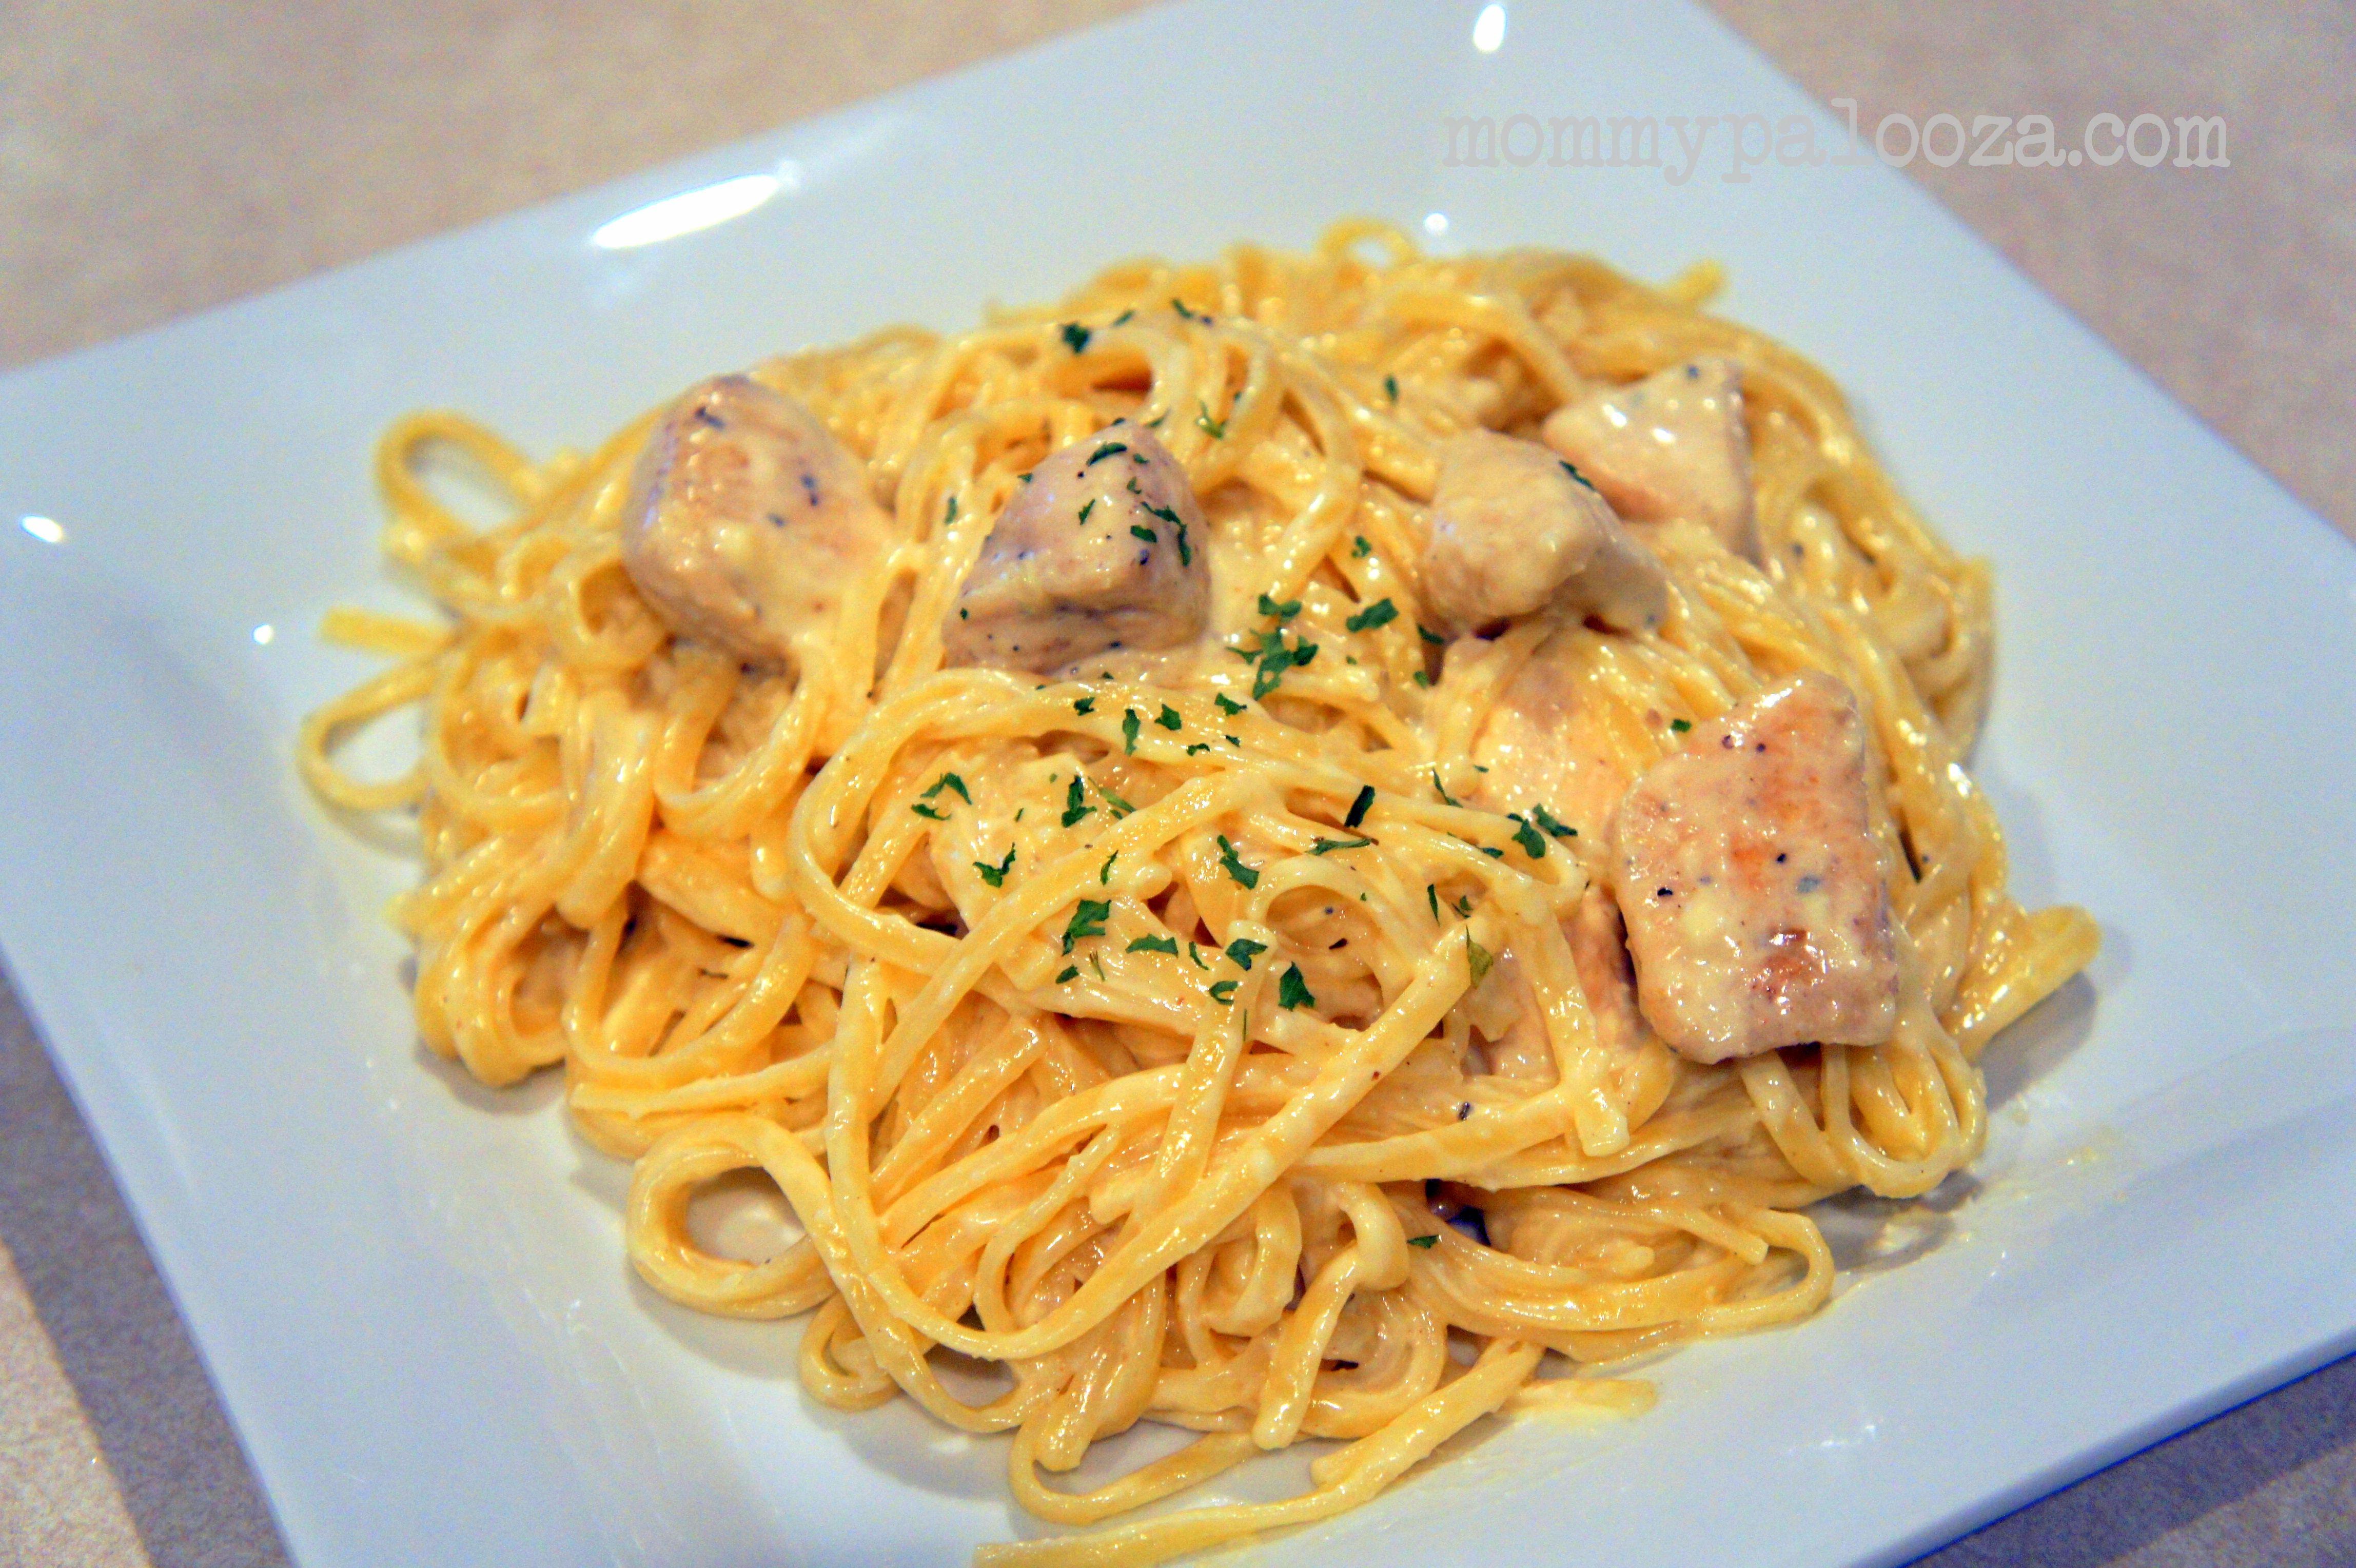 {Recipe} Olive Gardeninspired Chicken Fettucine Alfredo